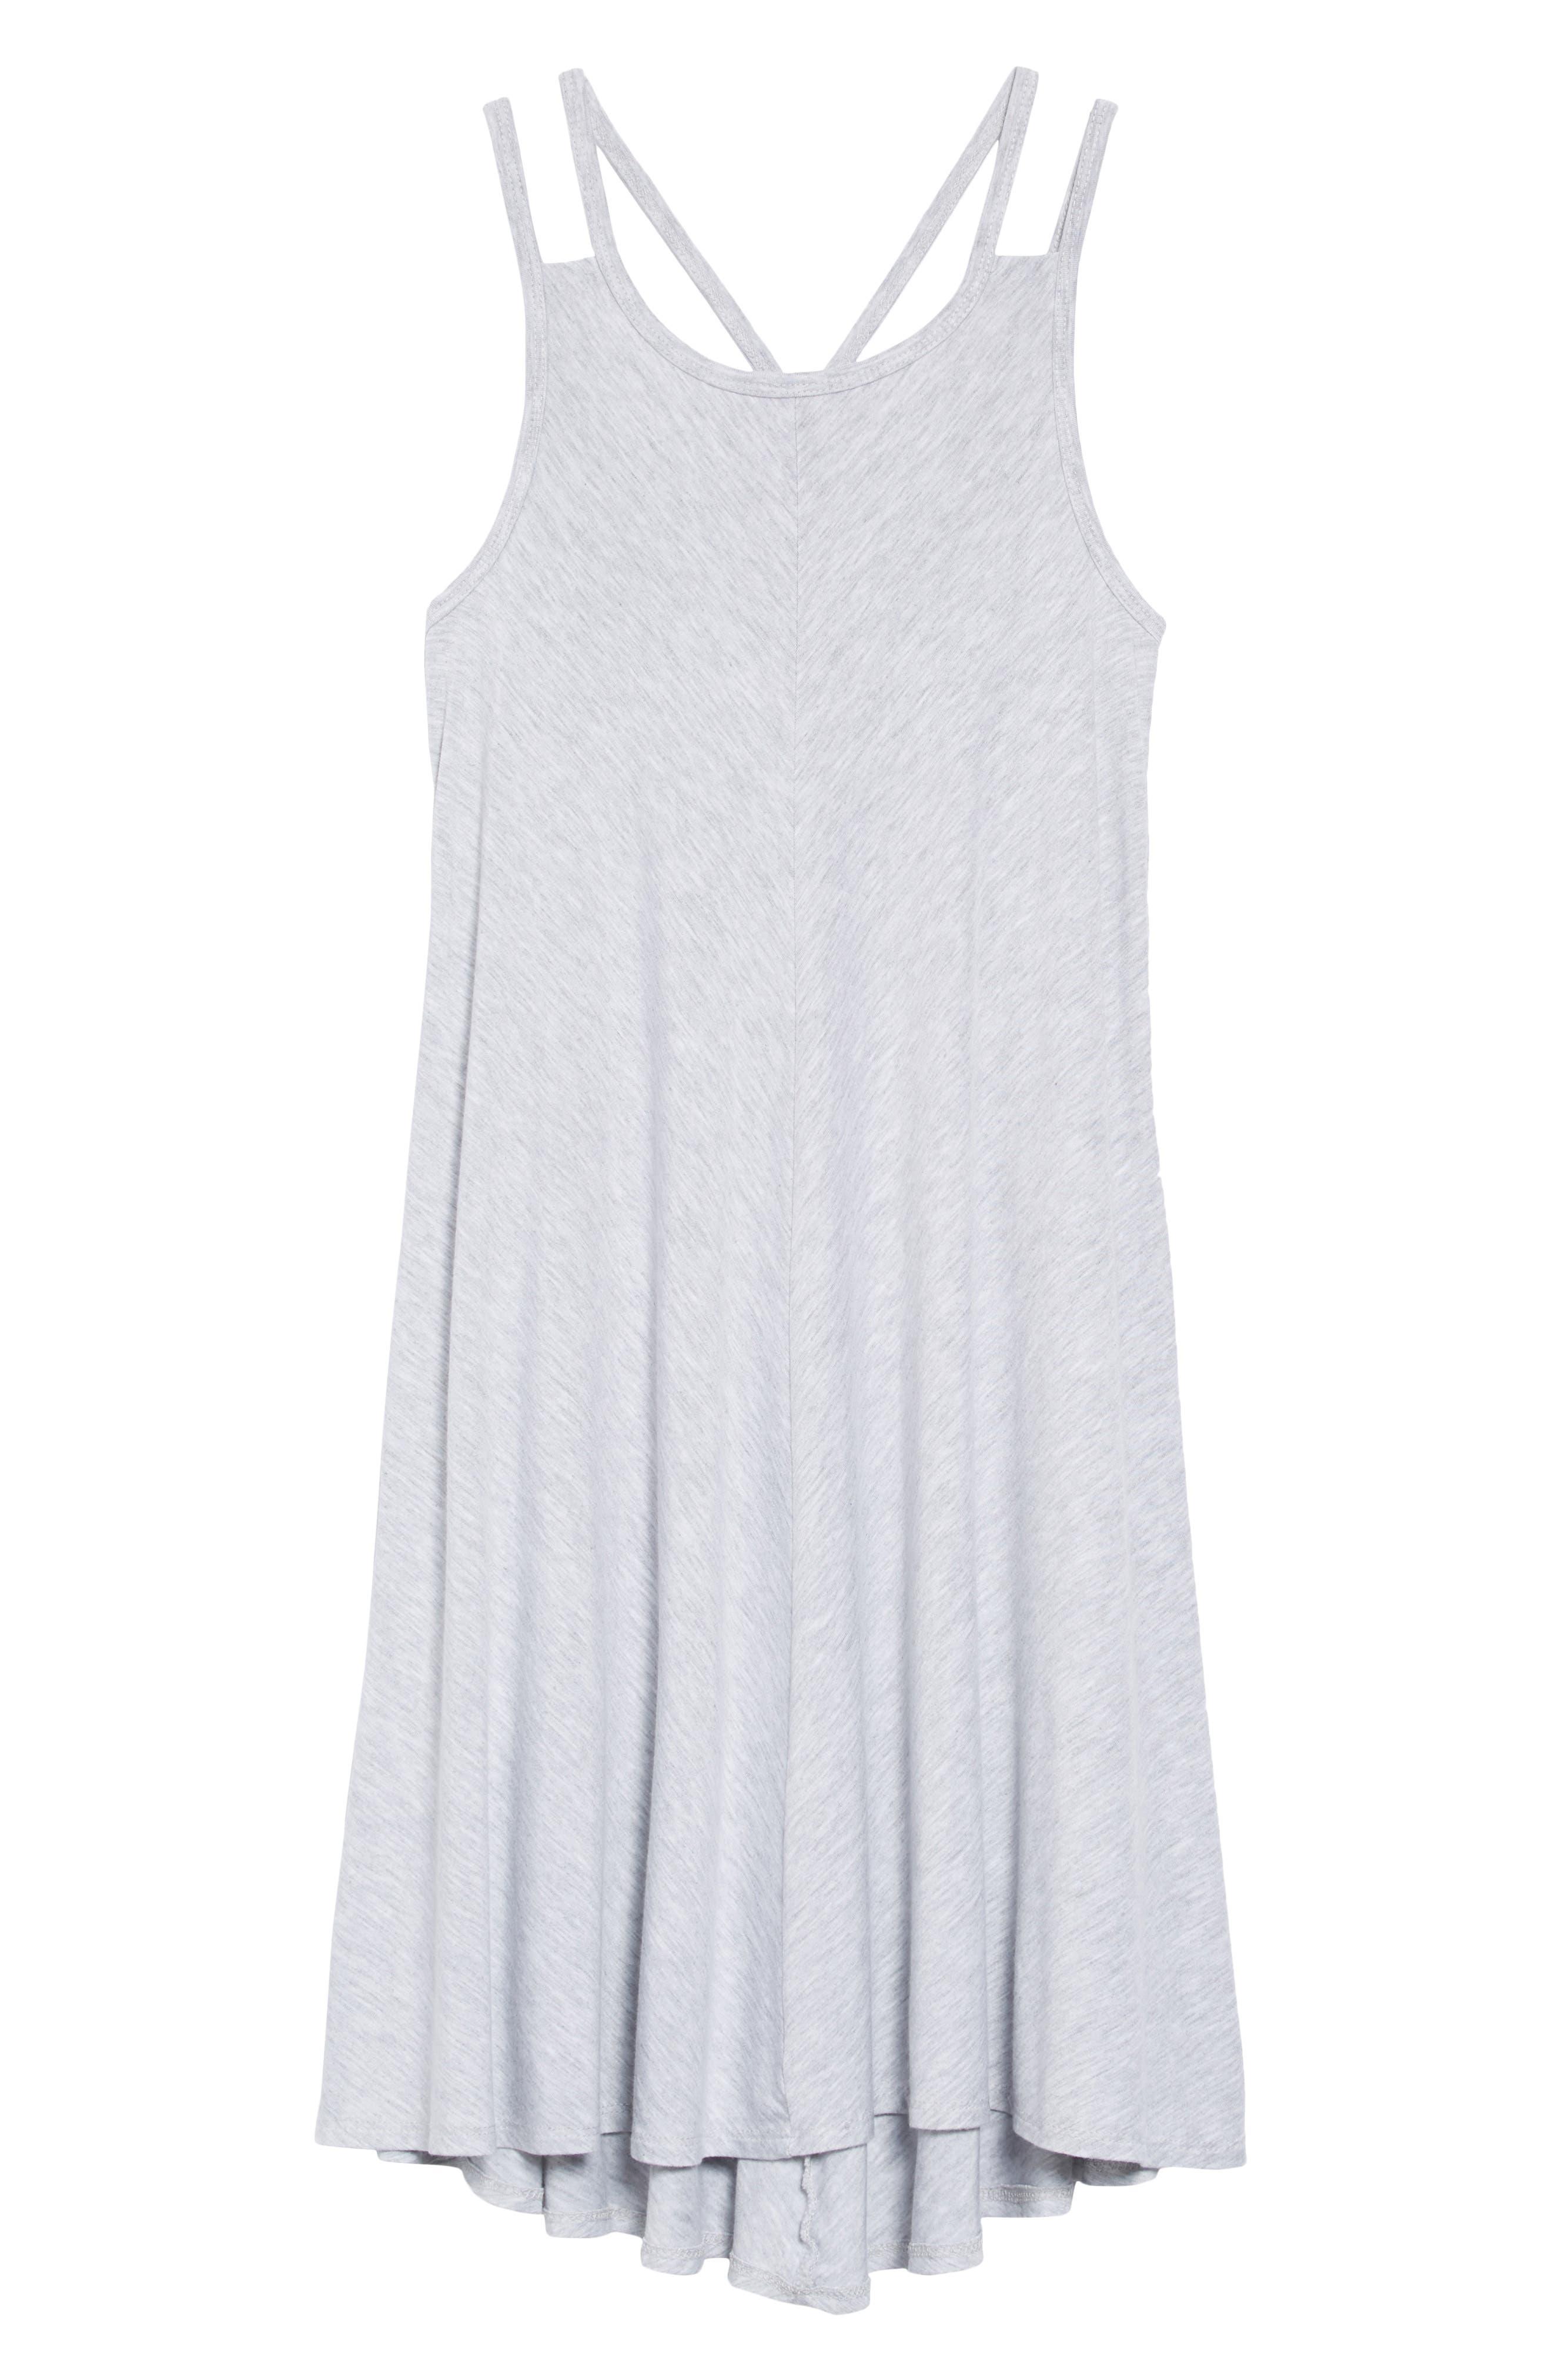 Strappy Dress,                             Main thumbnail 1, color,                             Grey Ash Heather